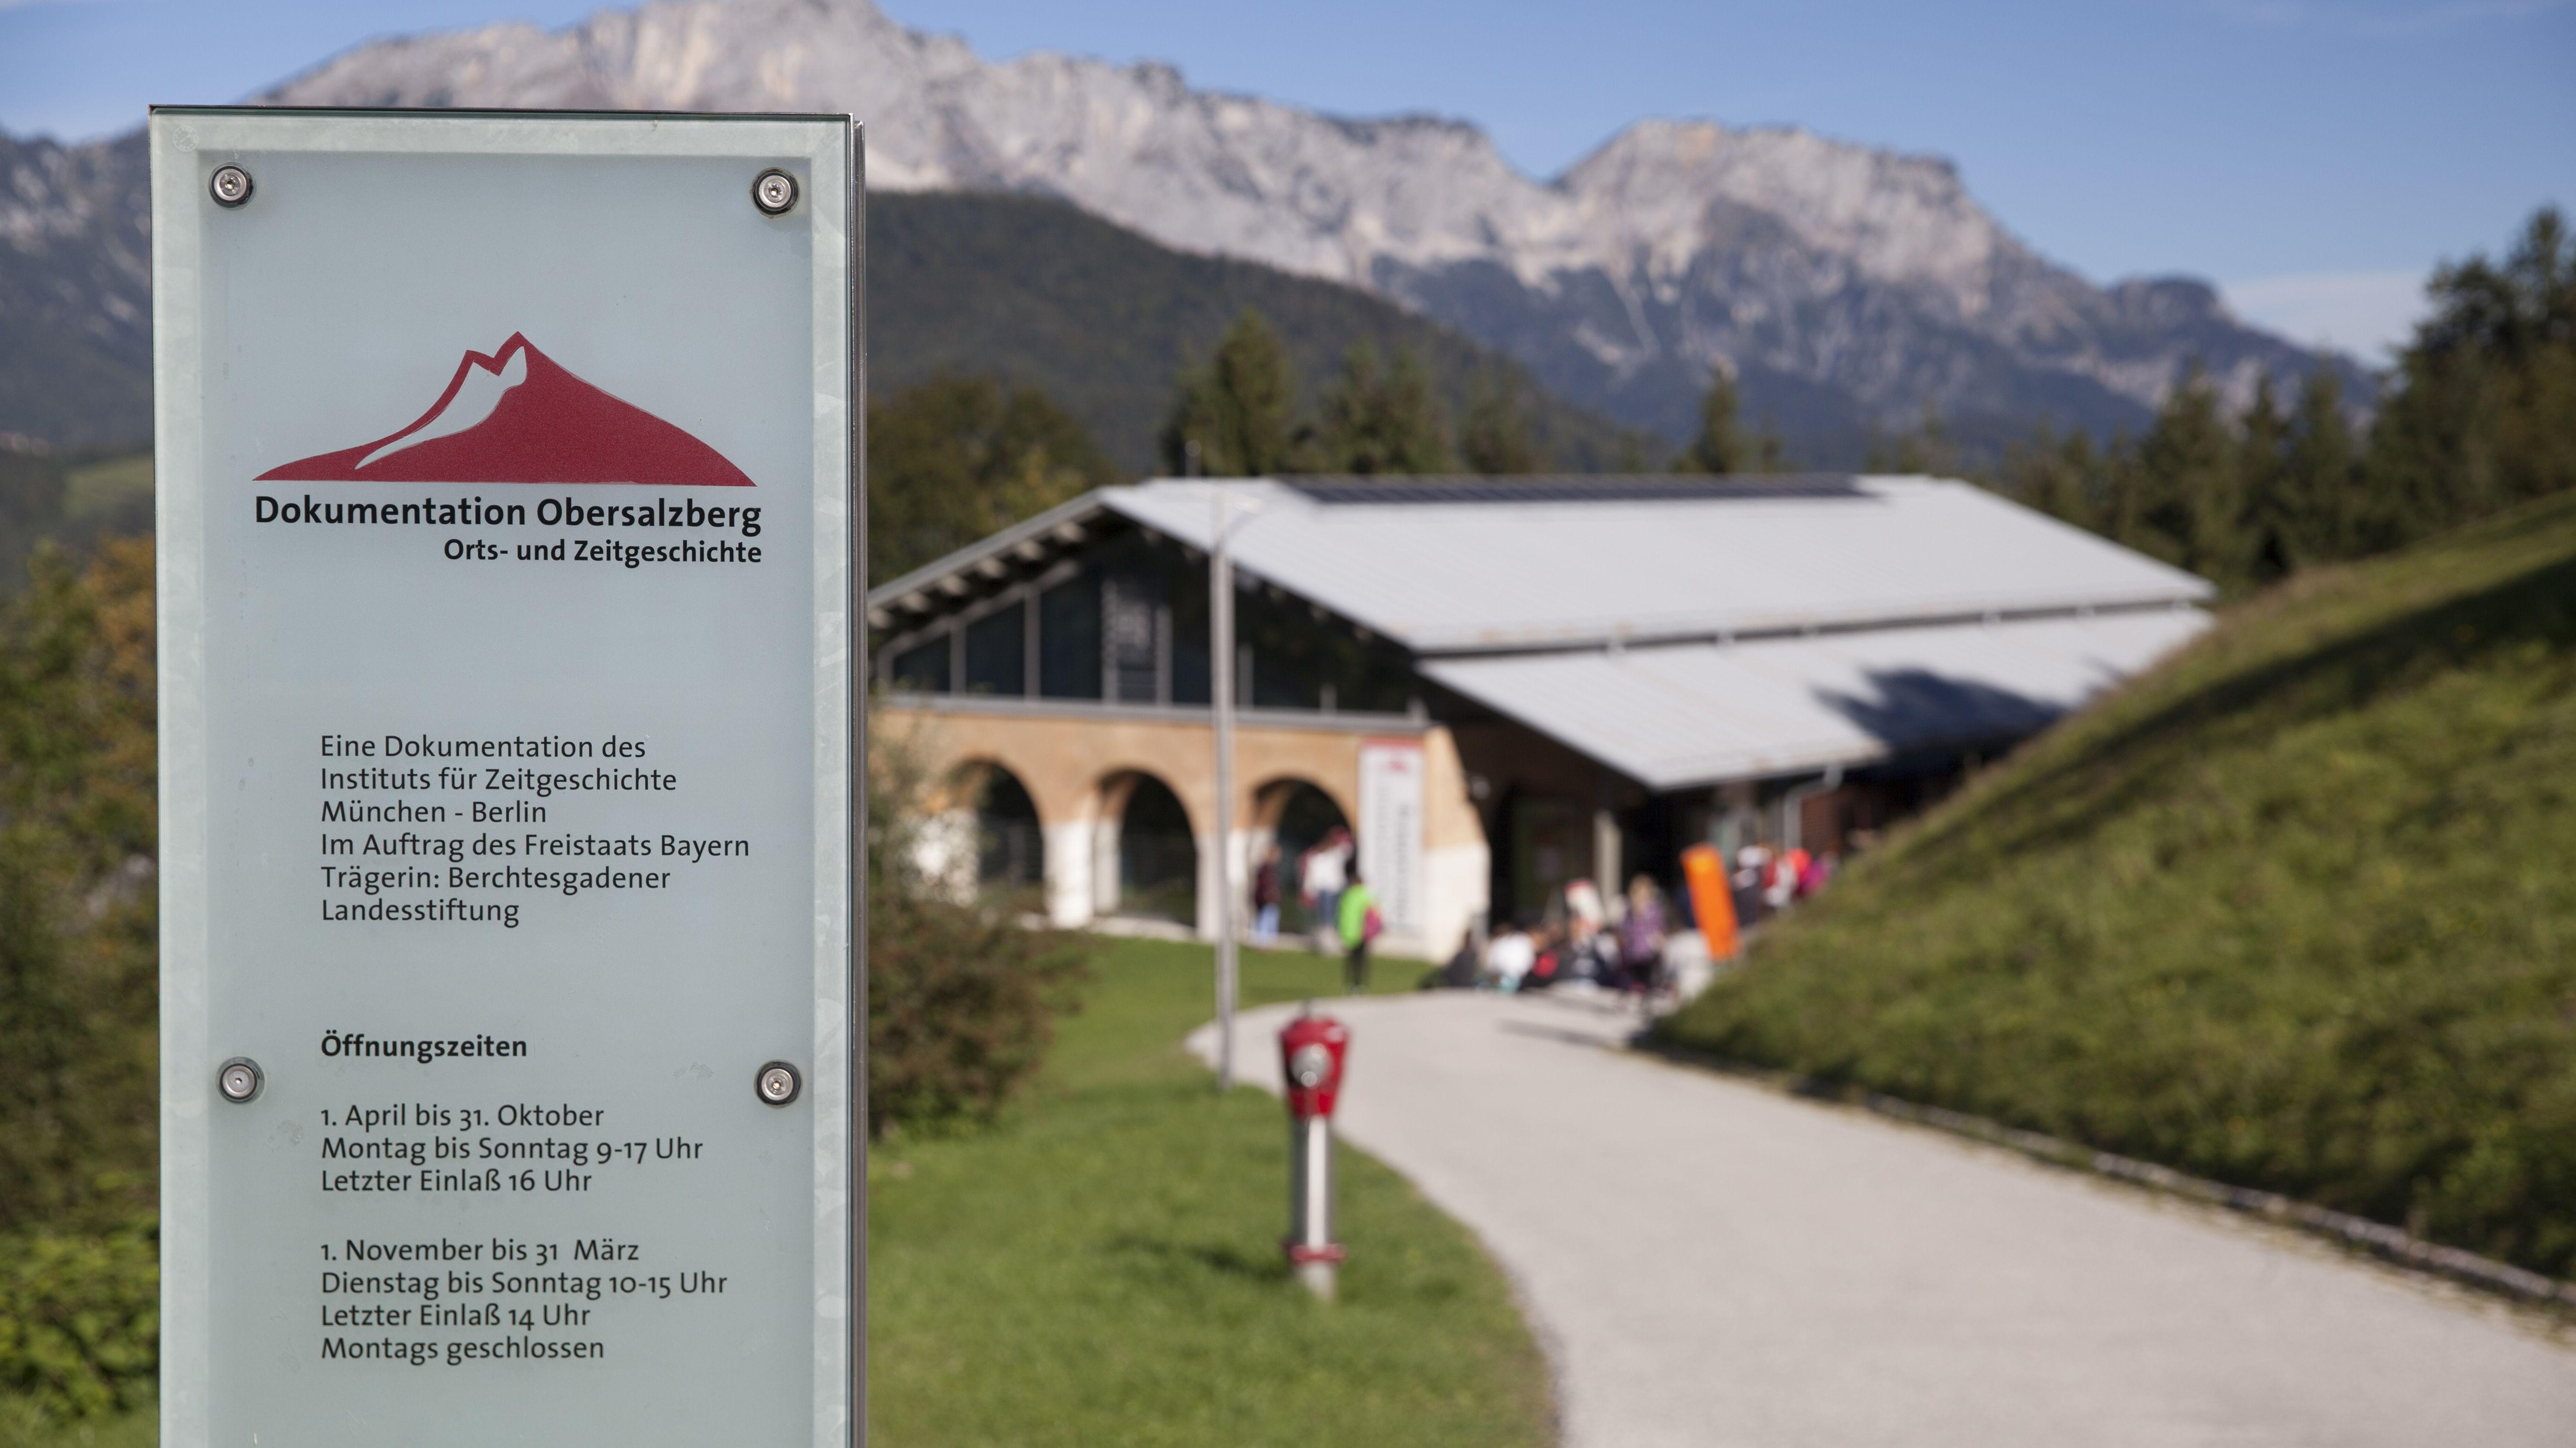 Die Dokumentation Obersalzberg